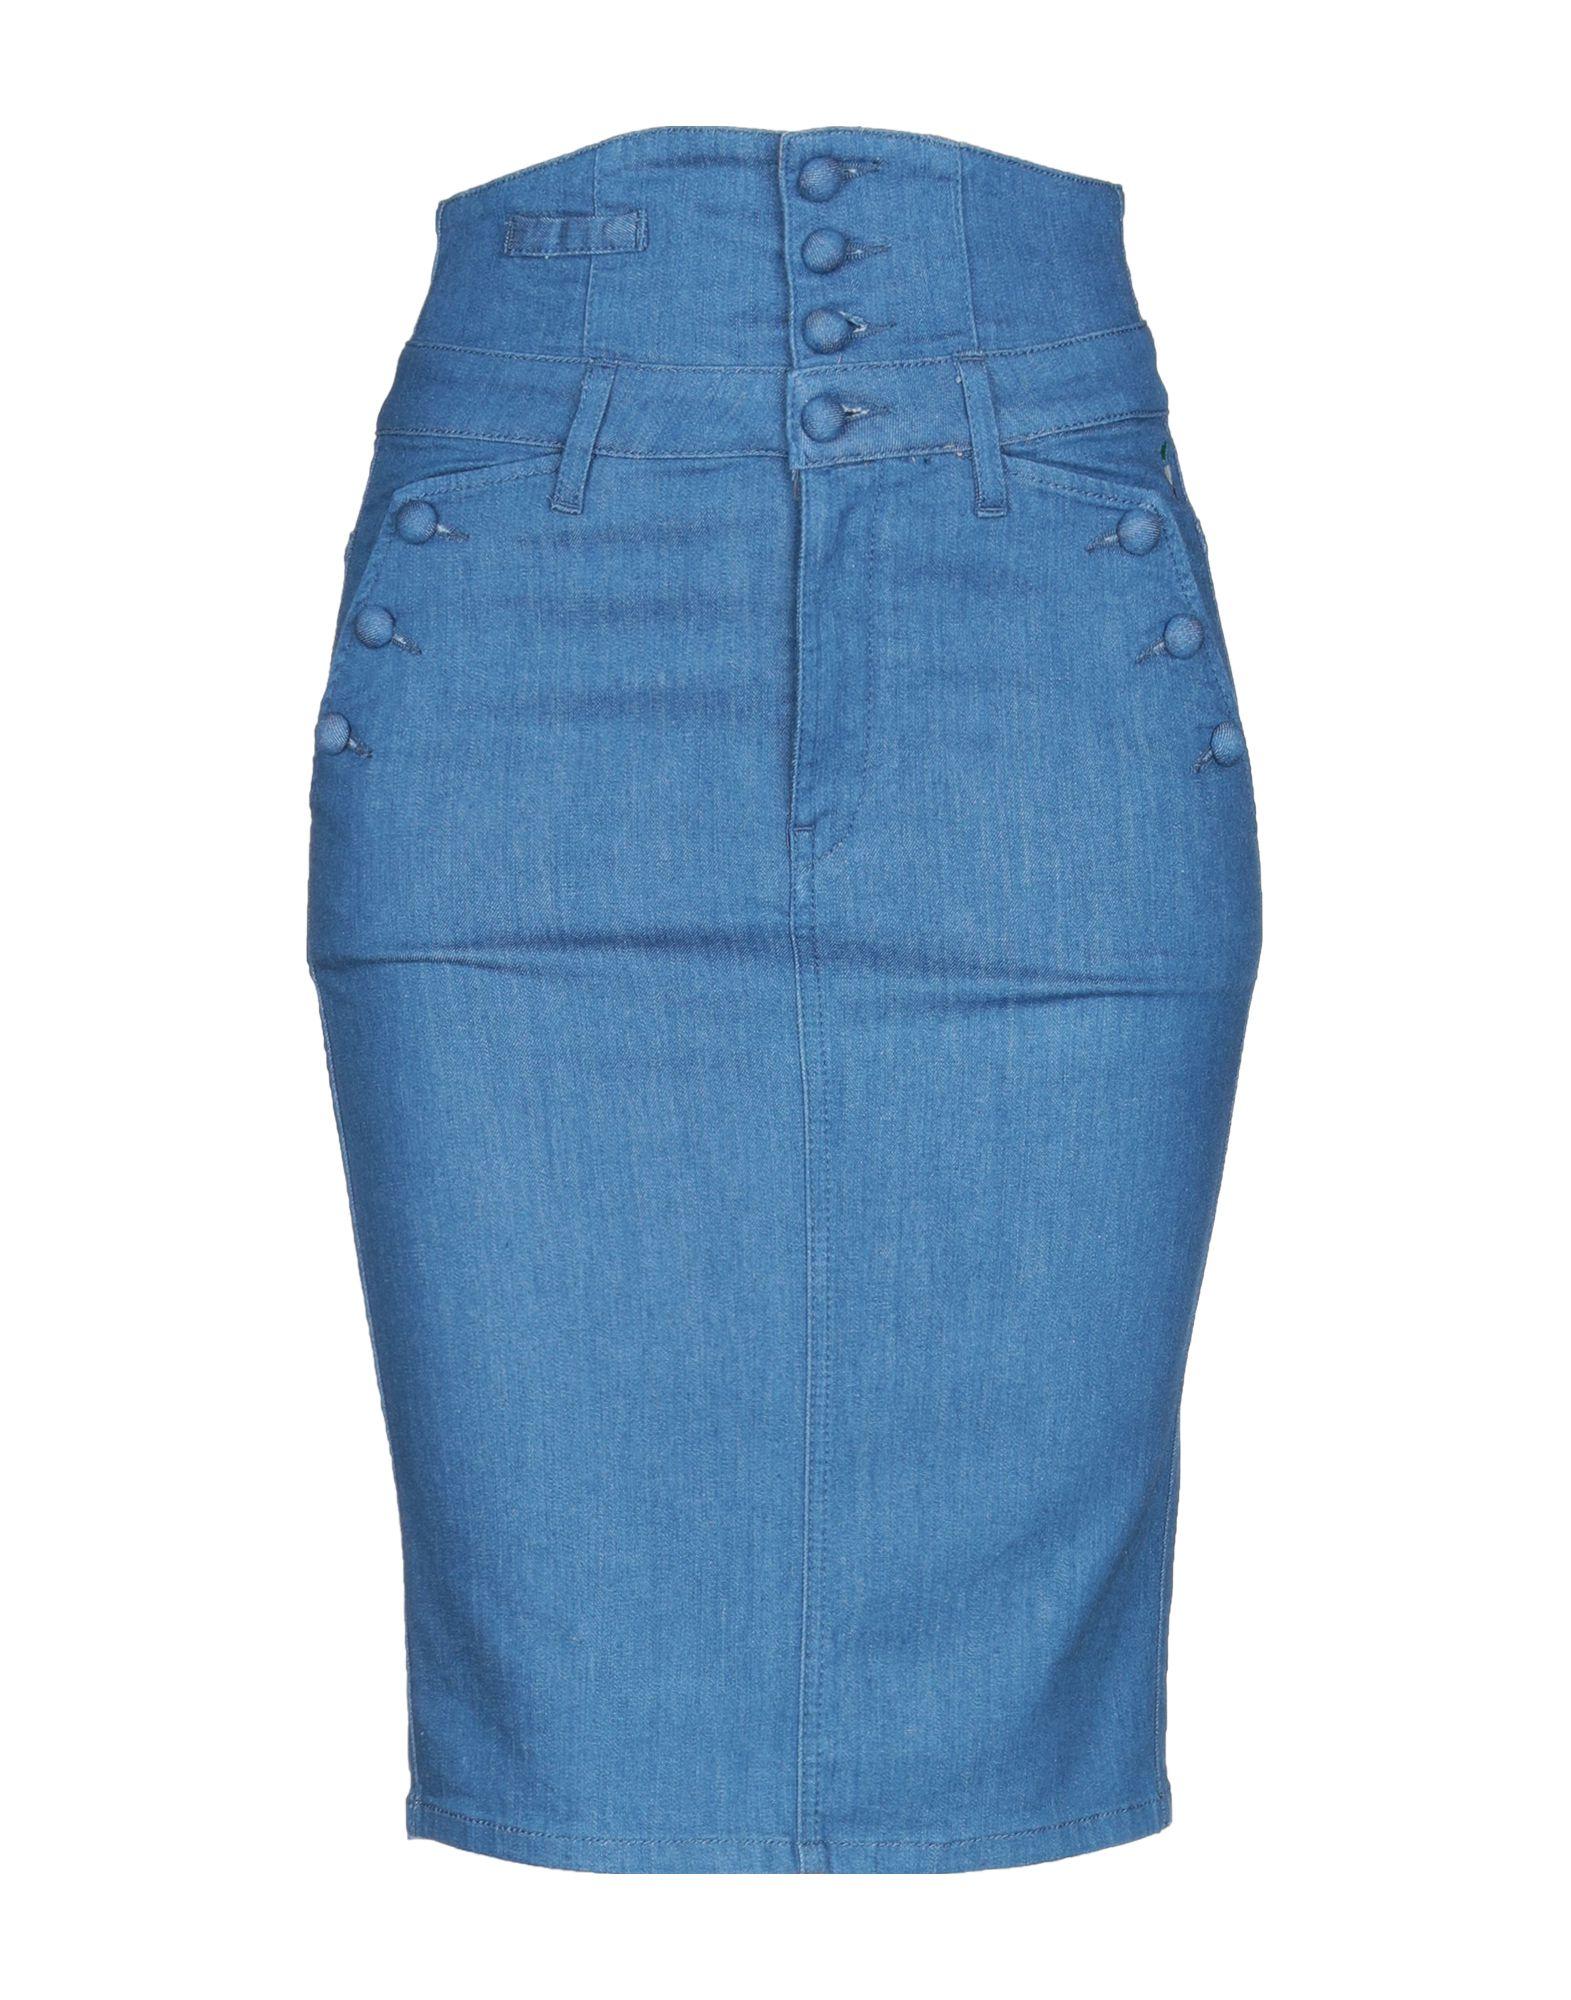 MISS SIXTY Джинсовая юбка сумка miss sixty 59214